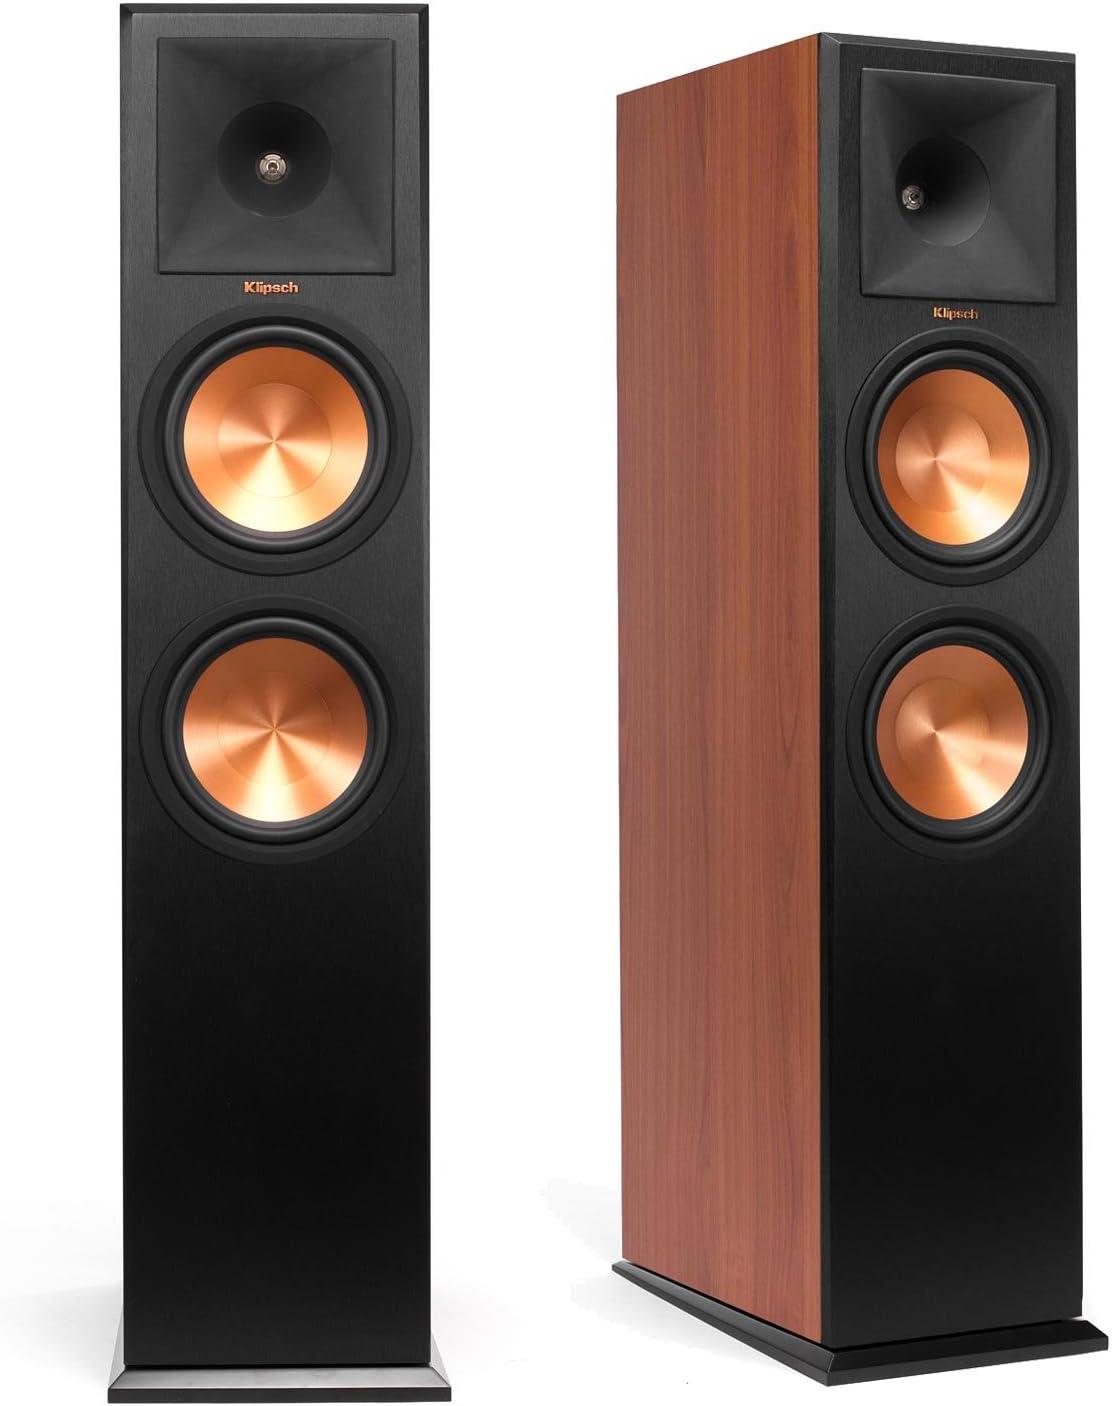 Klipsch RP280F Tower Speakers (Pair, Cherry)